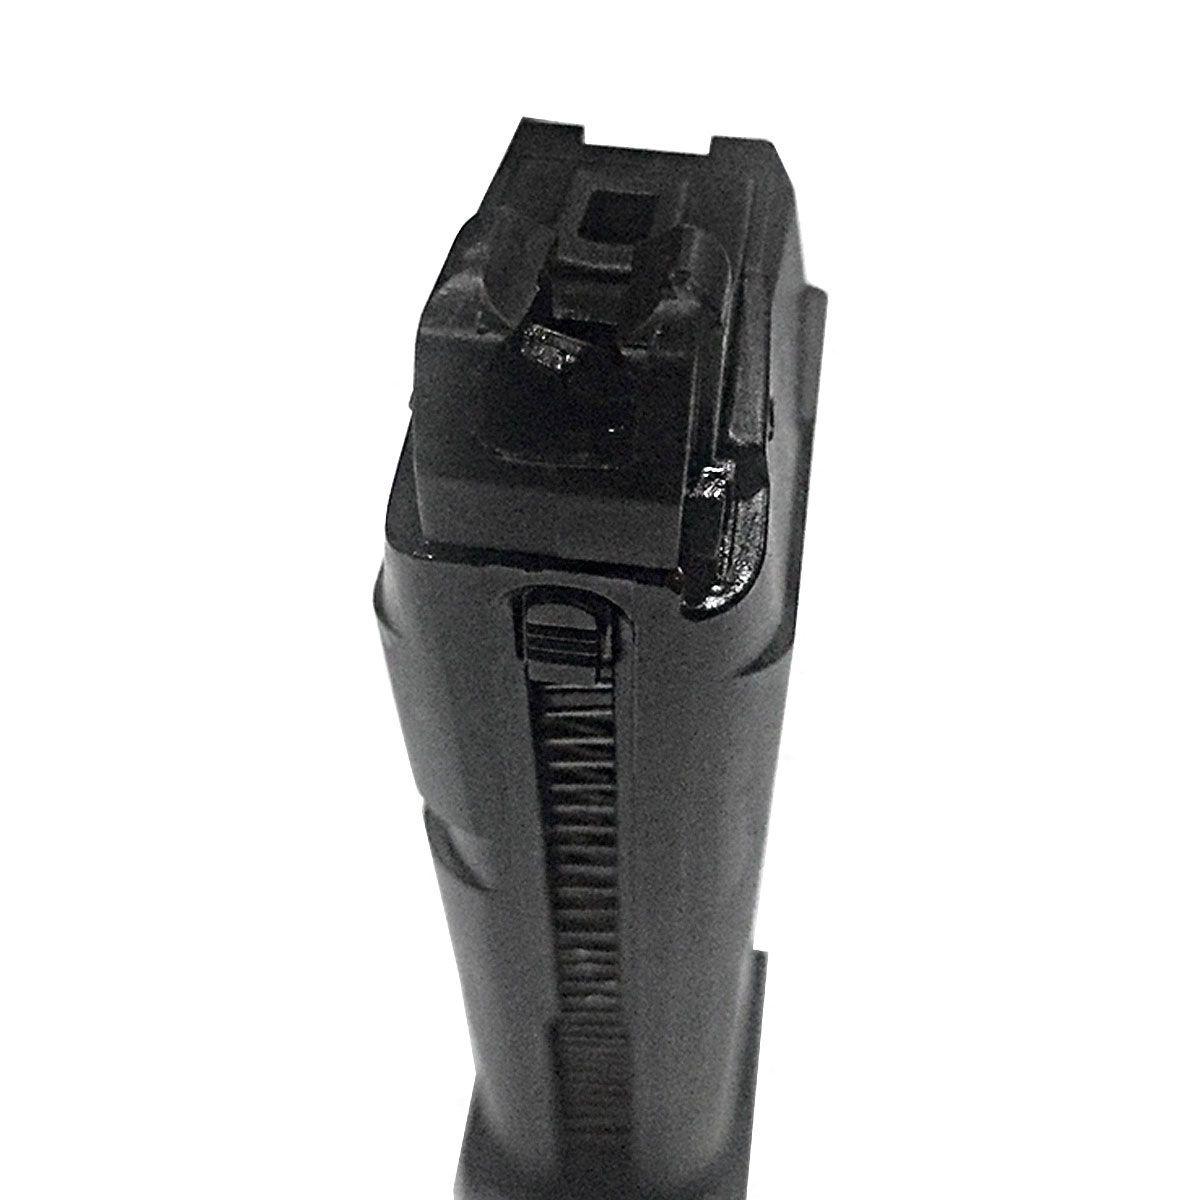 Magazine Para Pistola Airsoft GBB R17 22BBs Evo